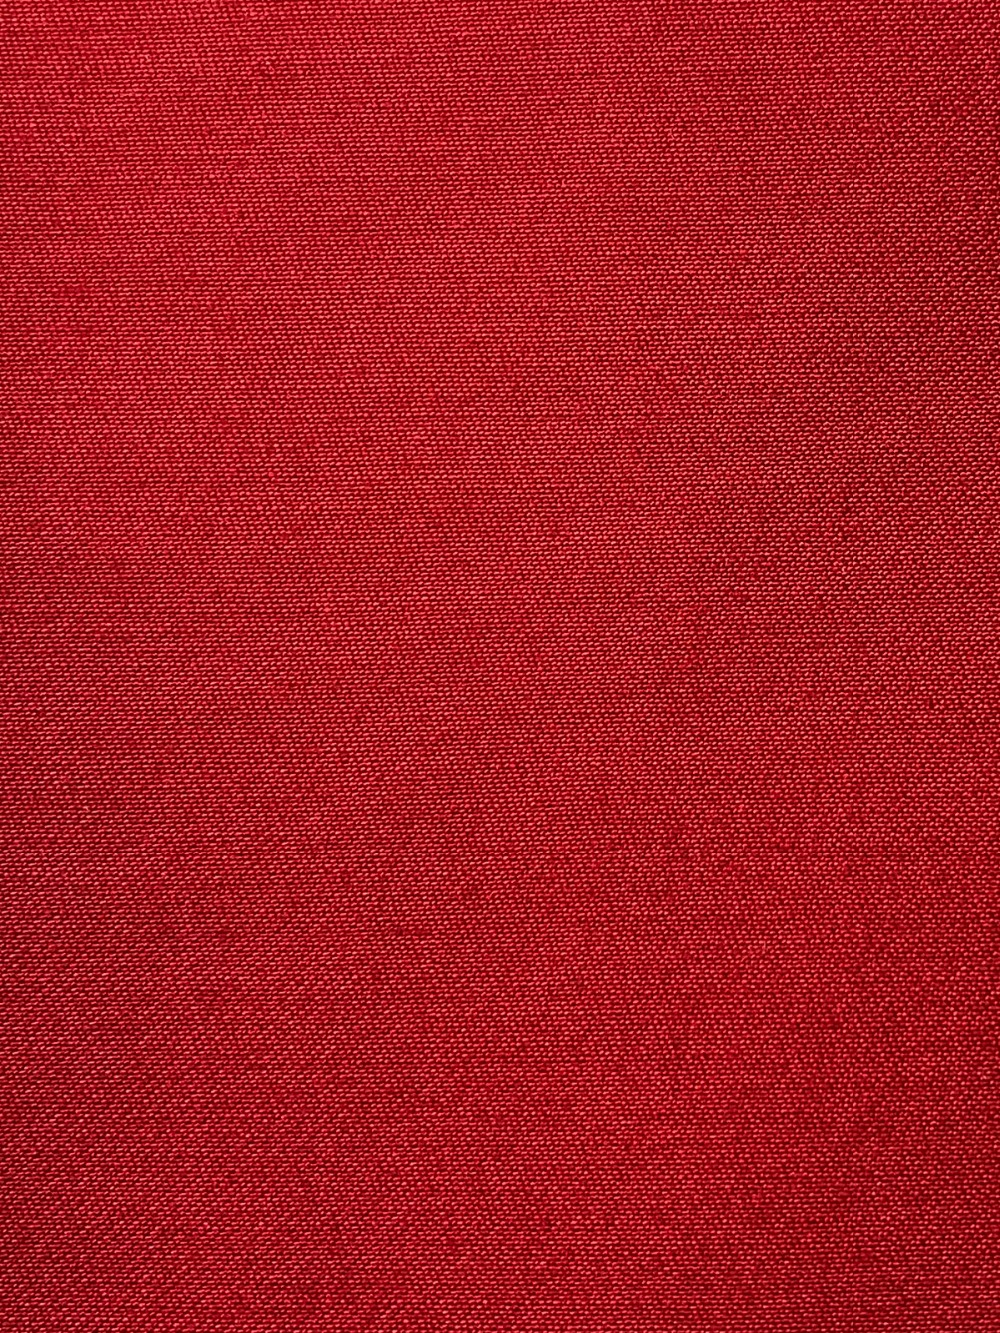 Light Burgundy สมาร์ท Casual Men ชุด 2019 แฟชั่นการออกแบบที่กำหนดเอง Made Slim Fit สีแดงเข้มชุดเสื้อชุดกางเกงงานแต่งงานชุด-ใน สูท จาก เสื้อผ้าผู้ชาย บน   2